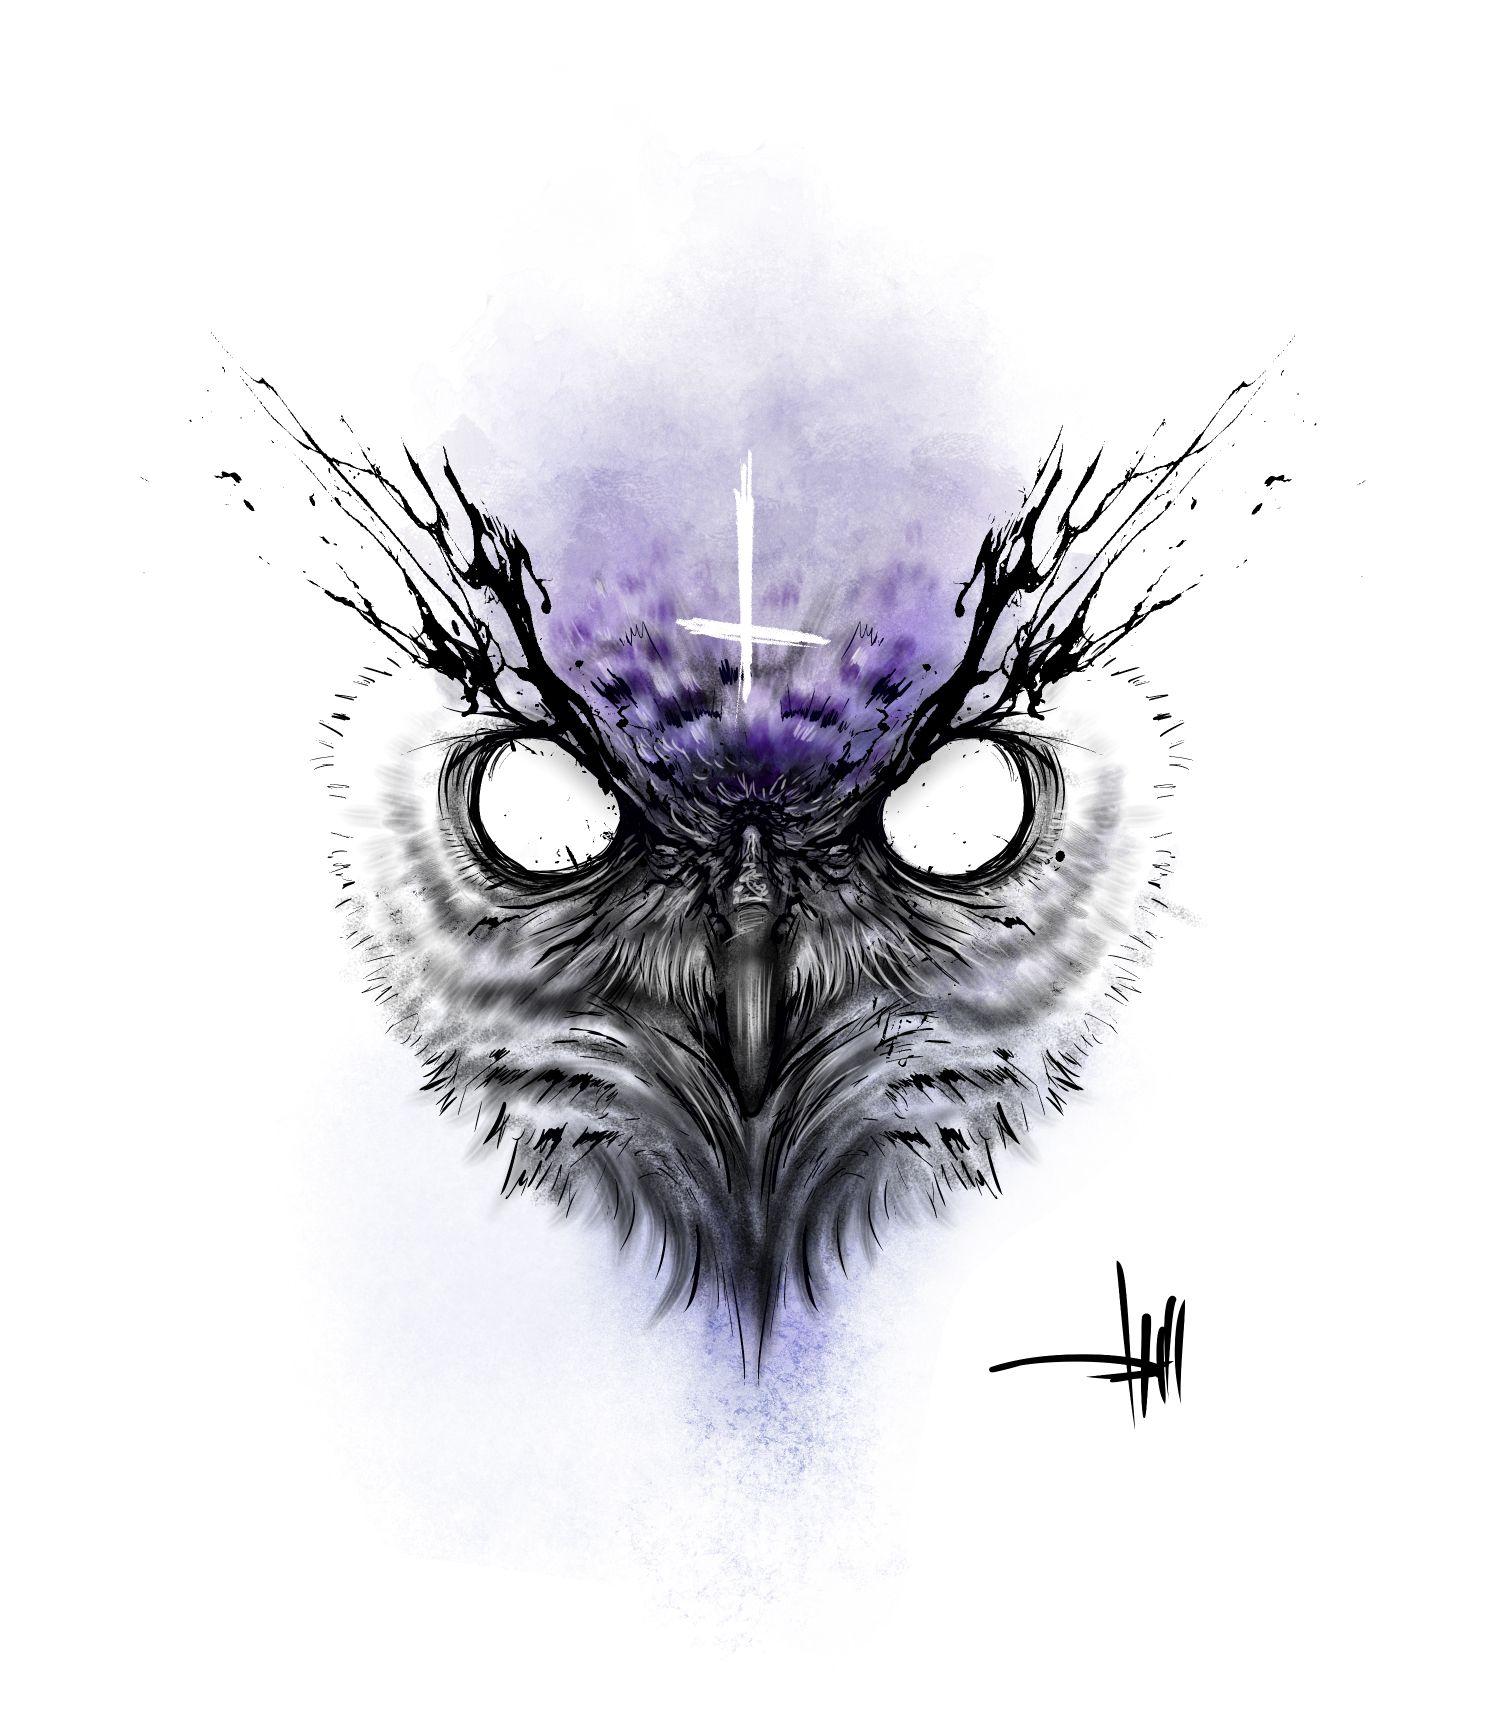 Evil Owl Design For A Tattoo Owl Eye Tattoo Owl Neck Tattoo Owl Tattoo Design